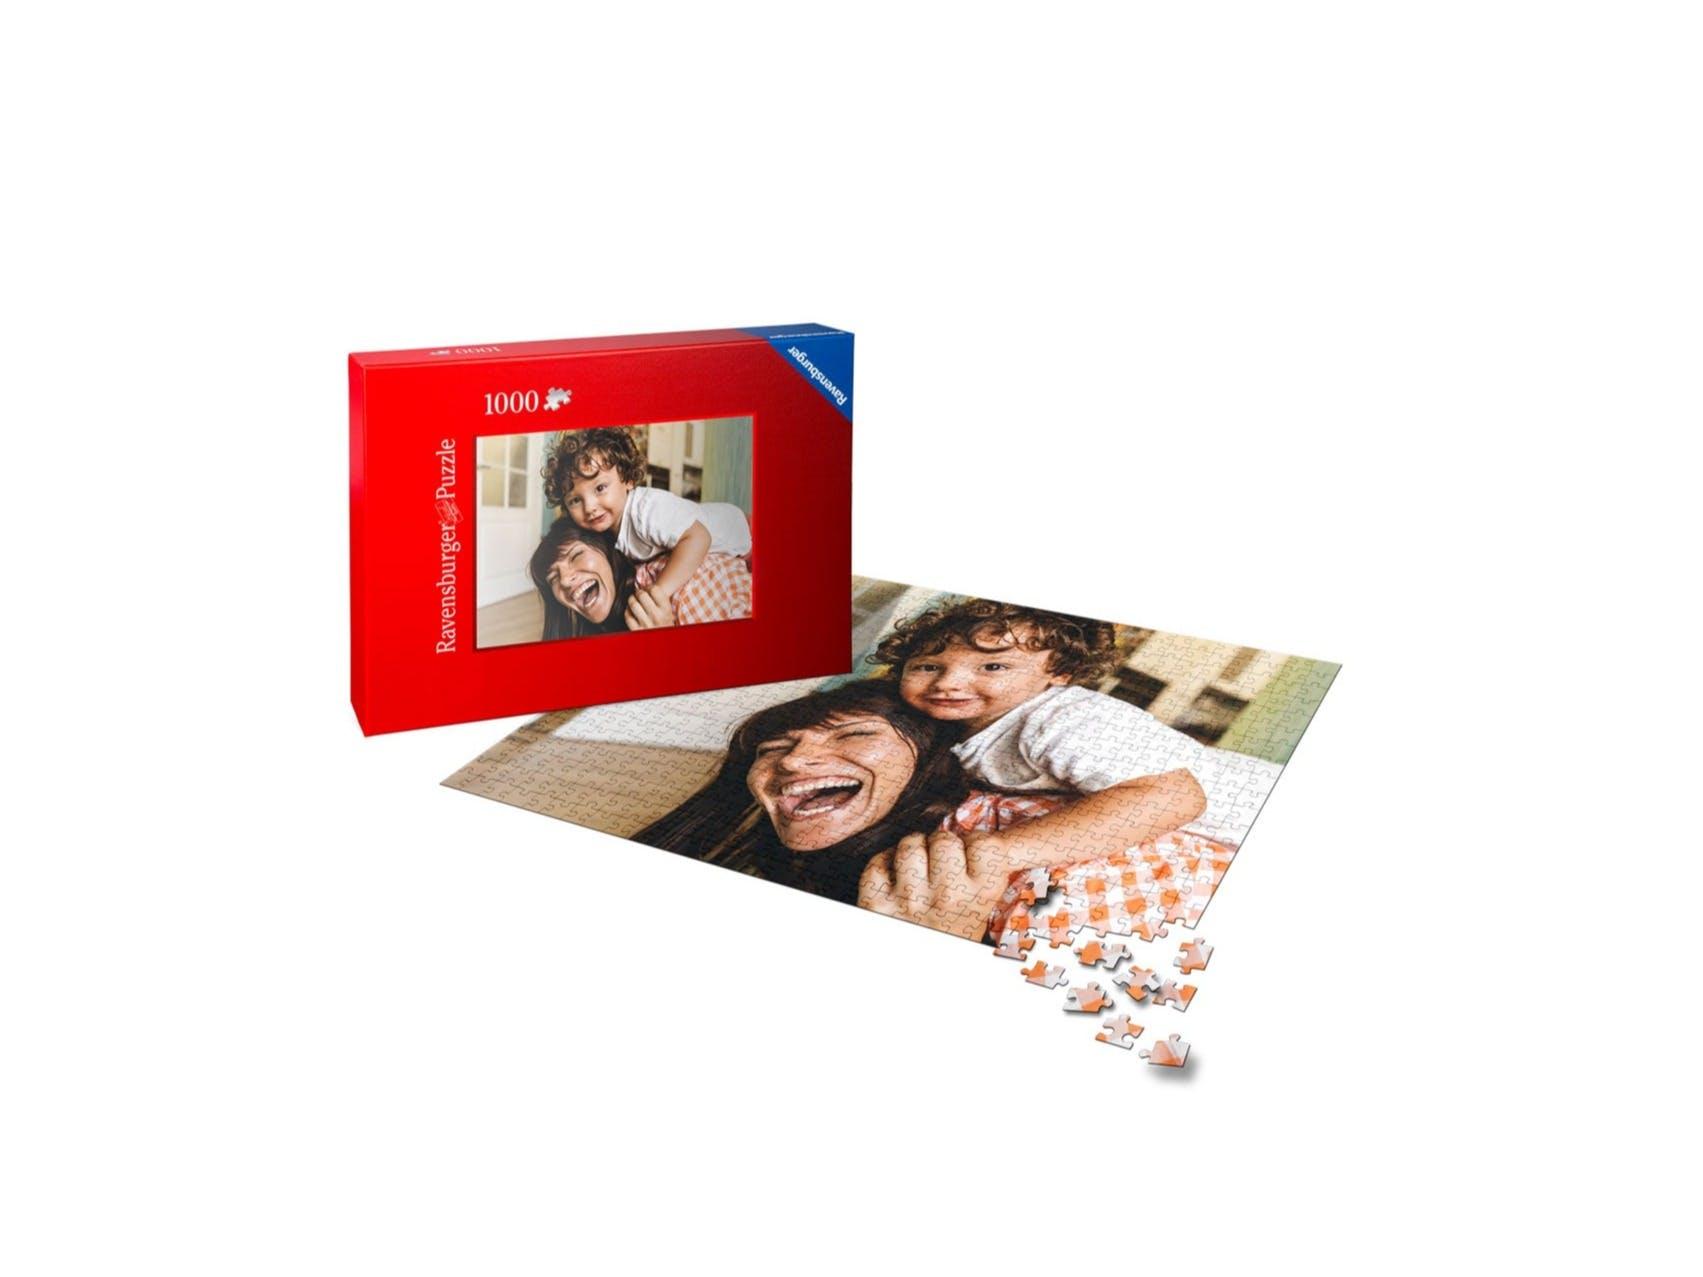 Freisteller Fotopuzzle Ravensburger 1000 Teile und Mutter-Kind-Motiv